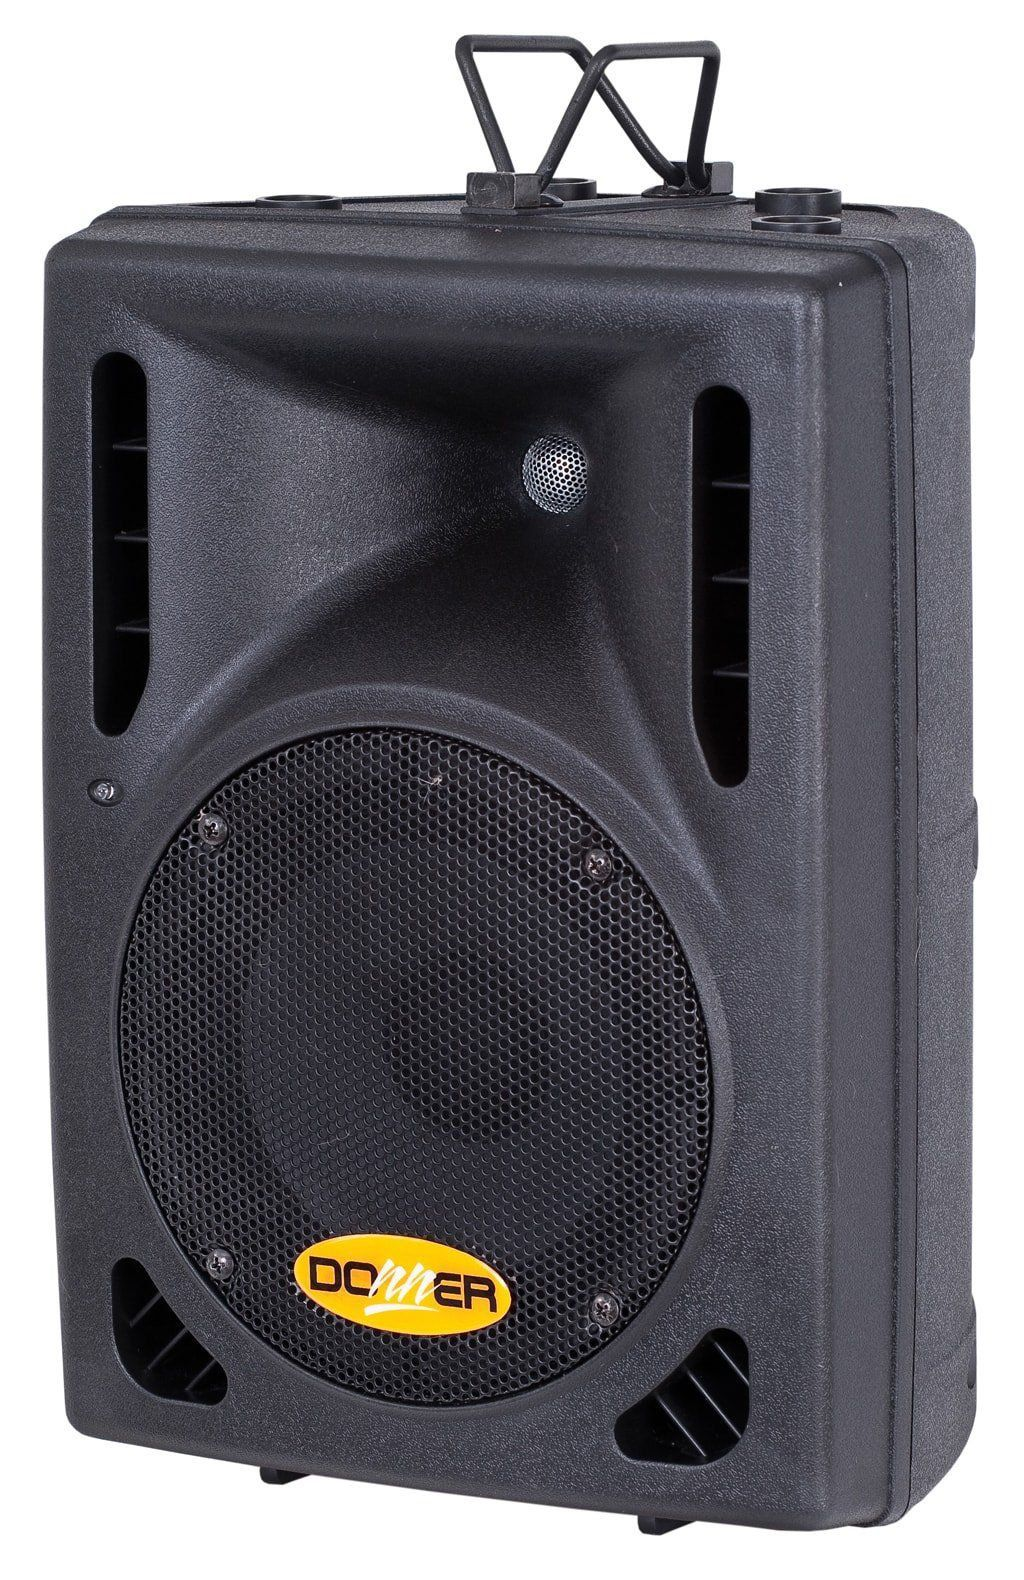 Caixa Passiva Donner CL100 P 8 Polegadas 100W